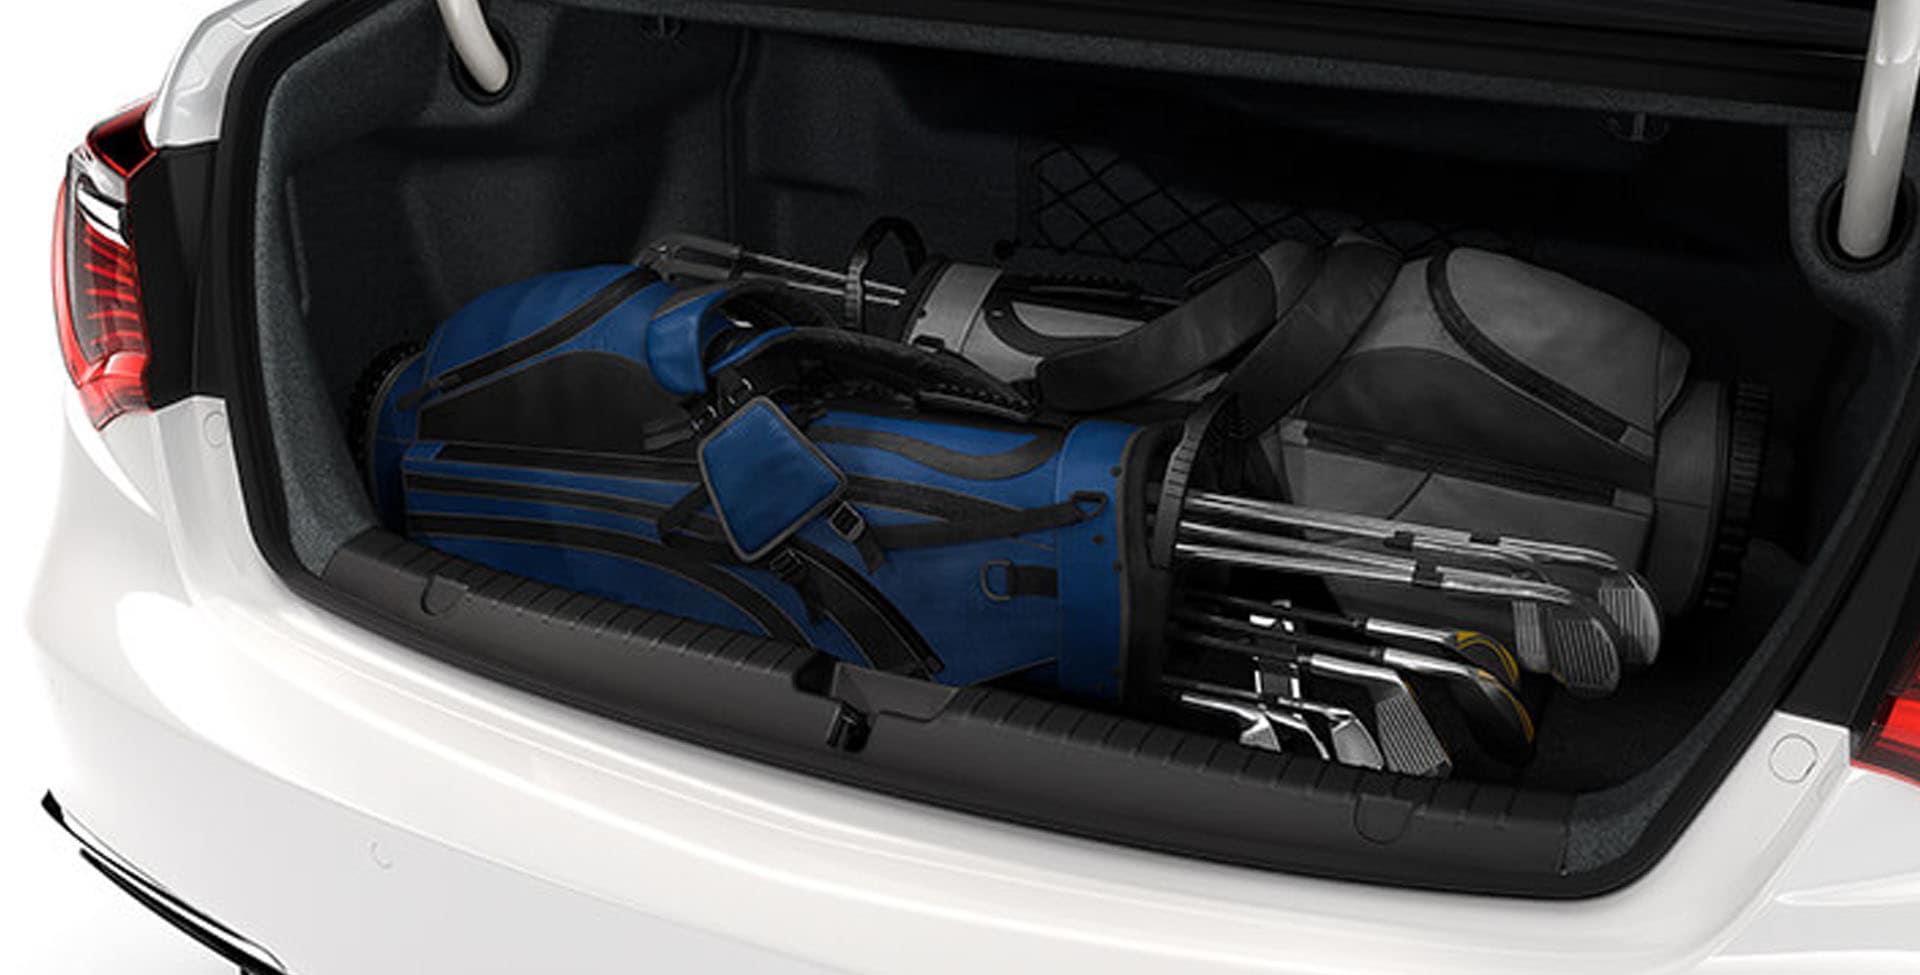 Acura RLX cargo space